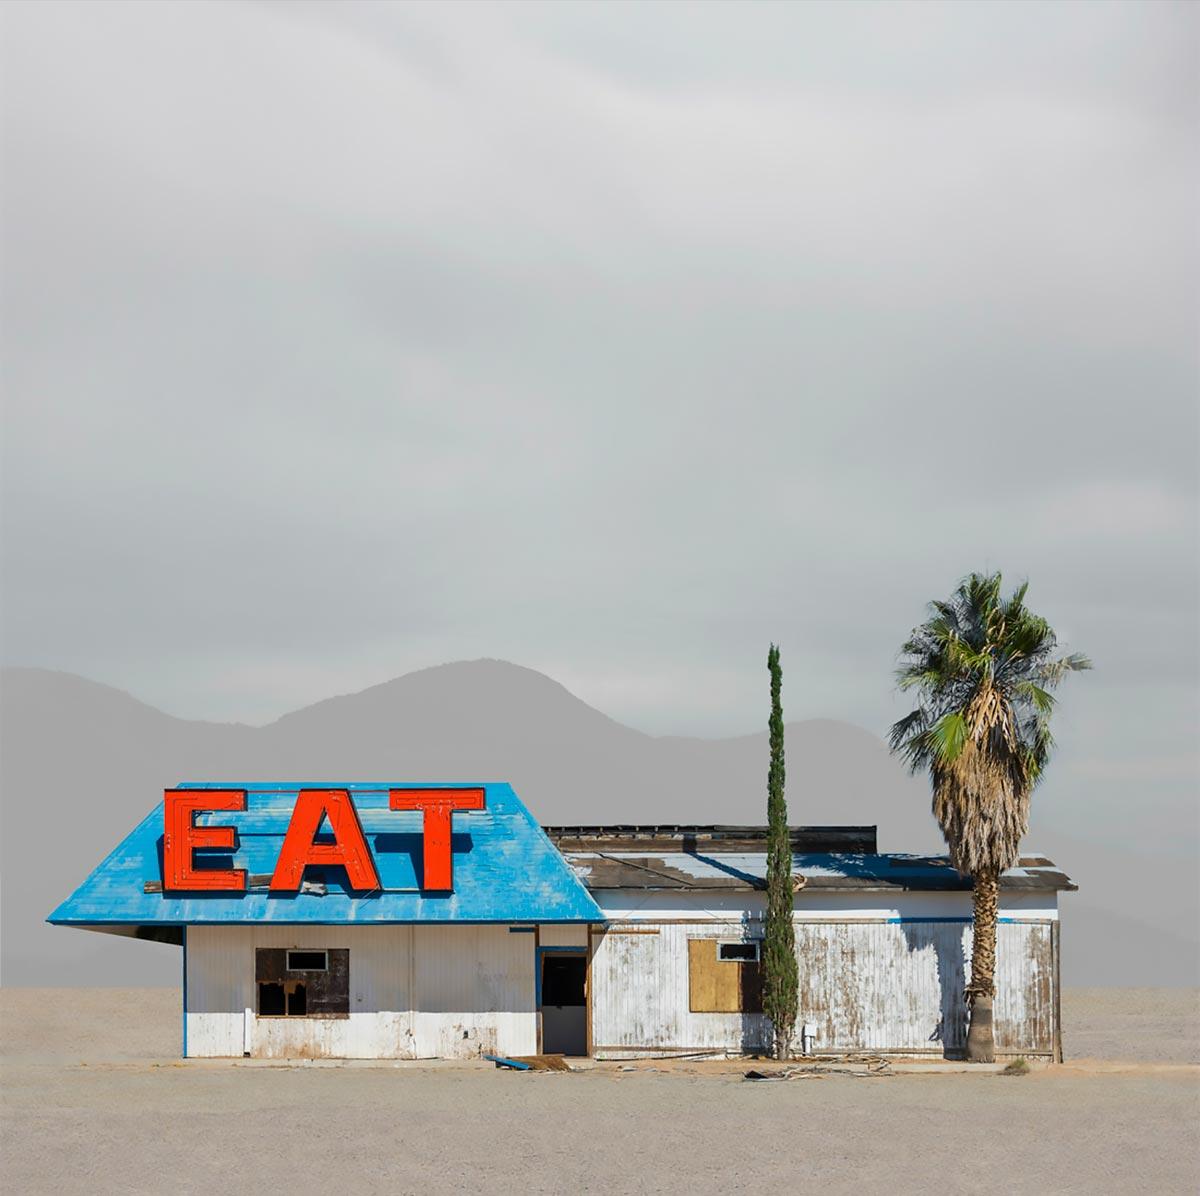 Ed Freeman: Western Realty